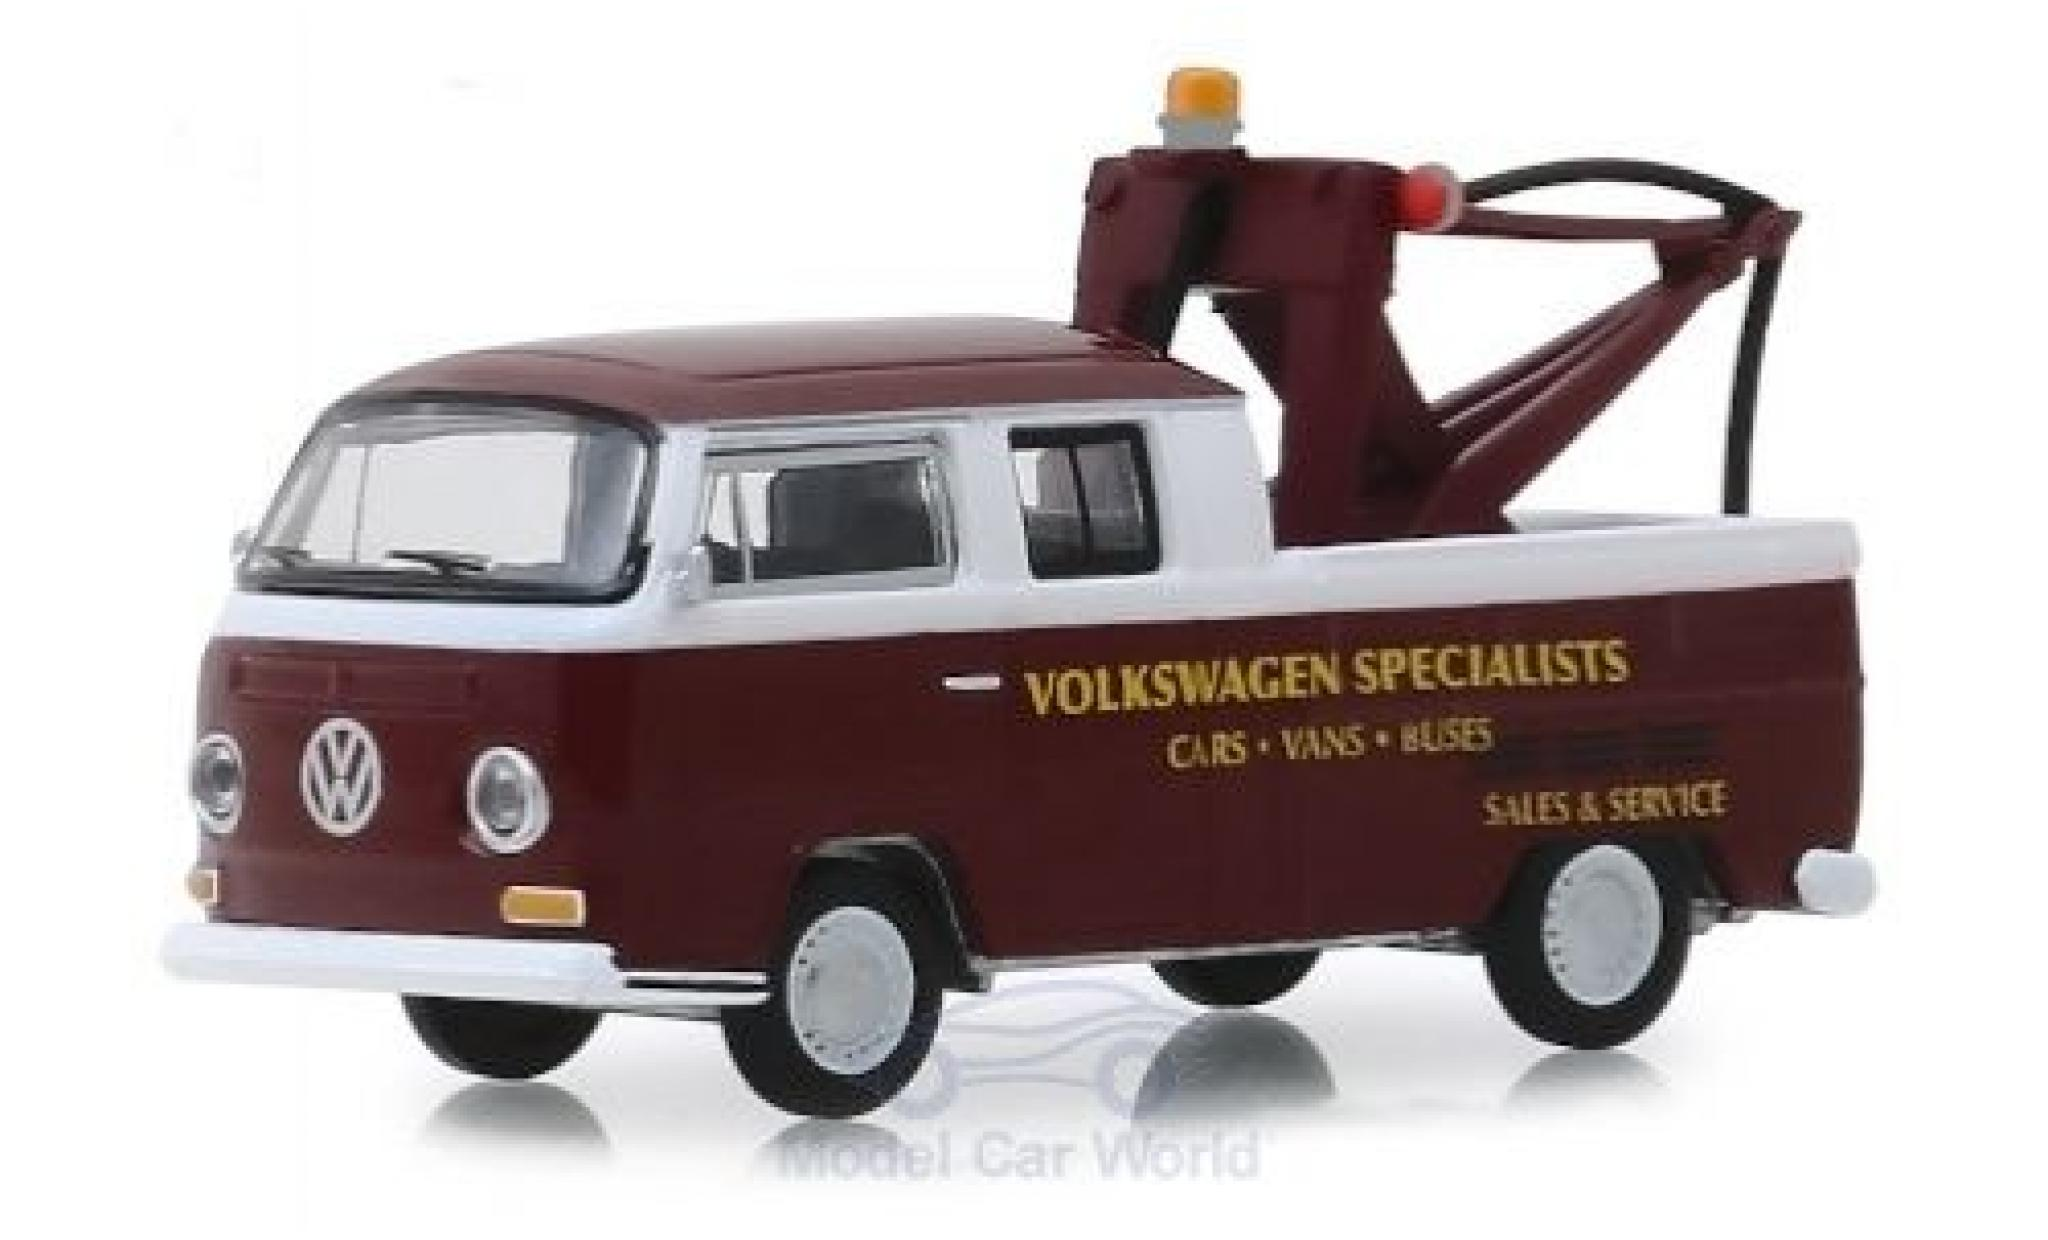 Volkswagen T2 1/64 Greenlight DoKa Abschleppwagen Specialists 1968